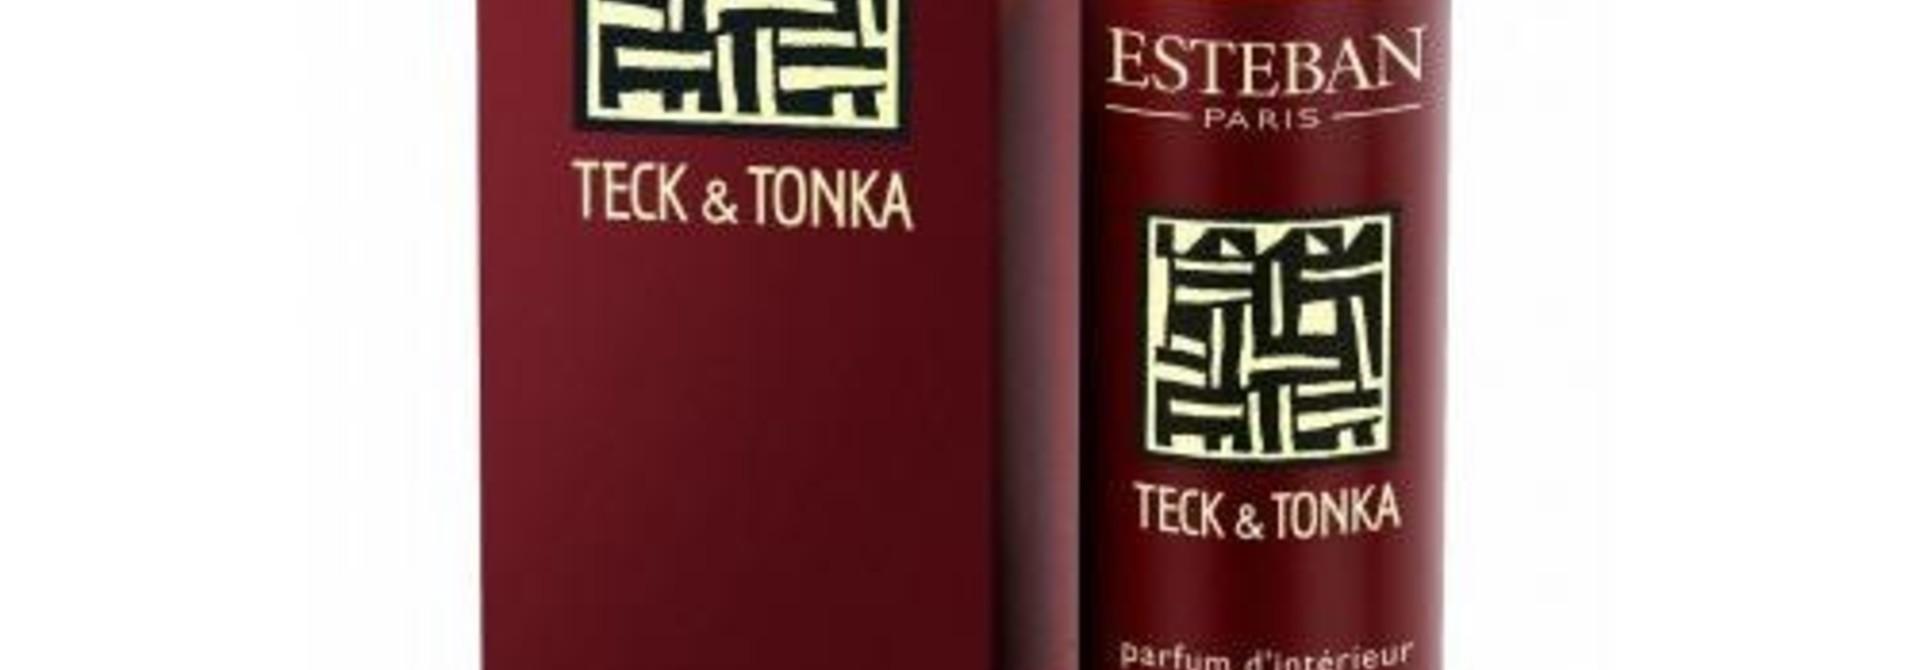 ESTEBAN - Spray  Teak and Tonka Spray 100ml